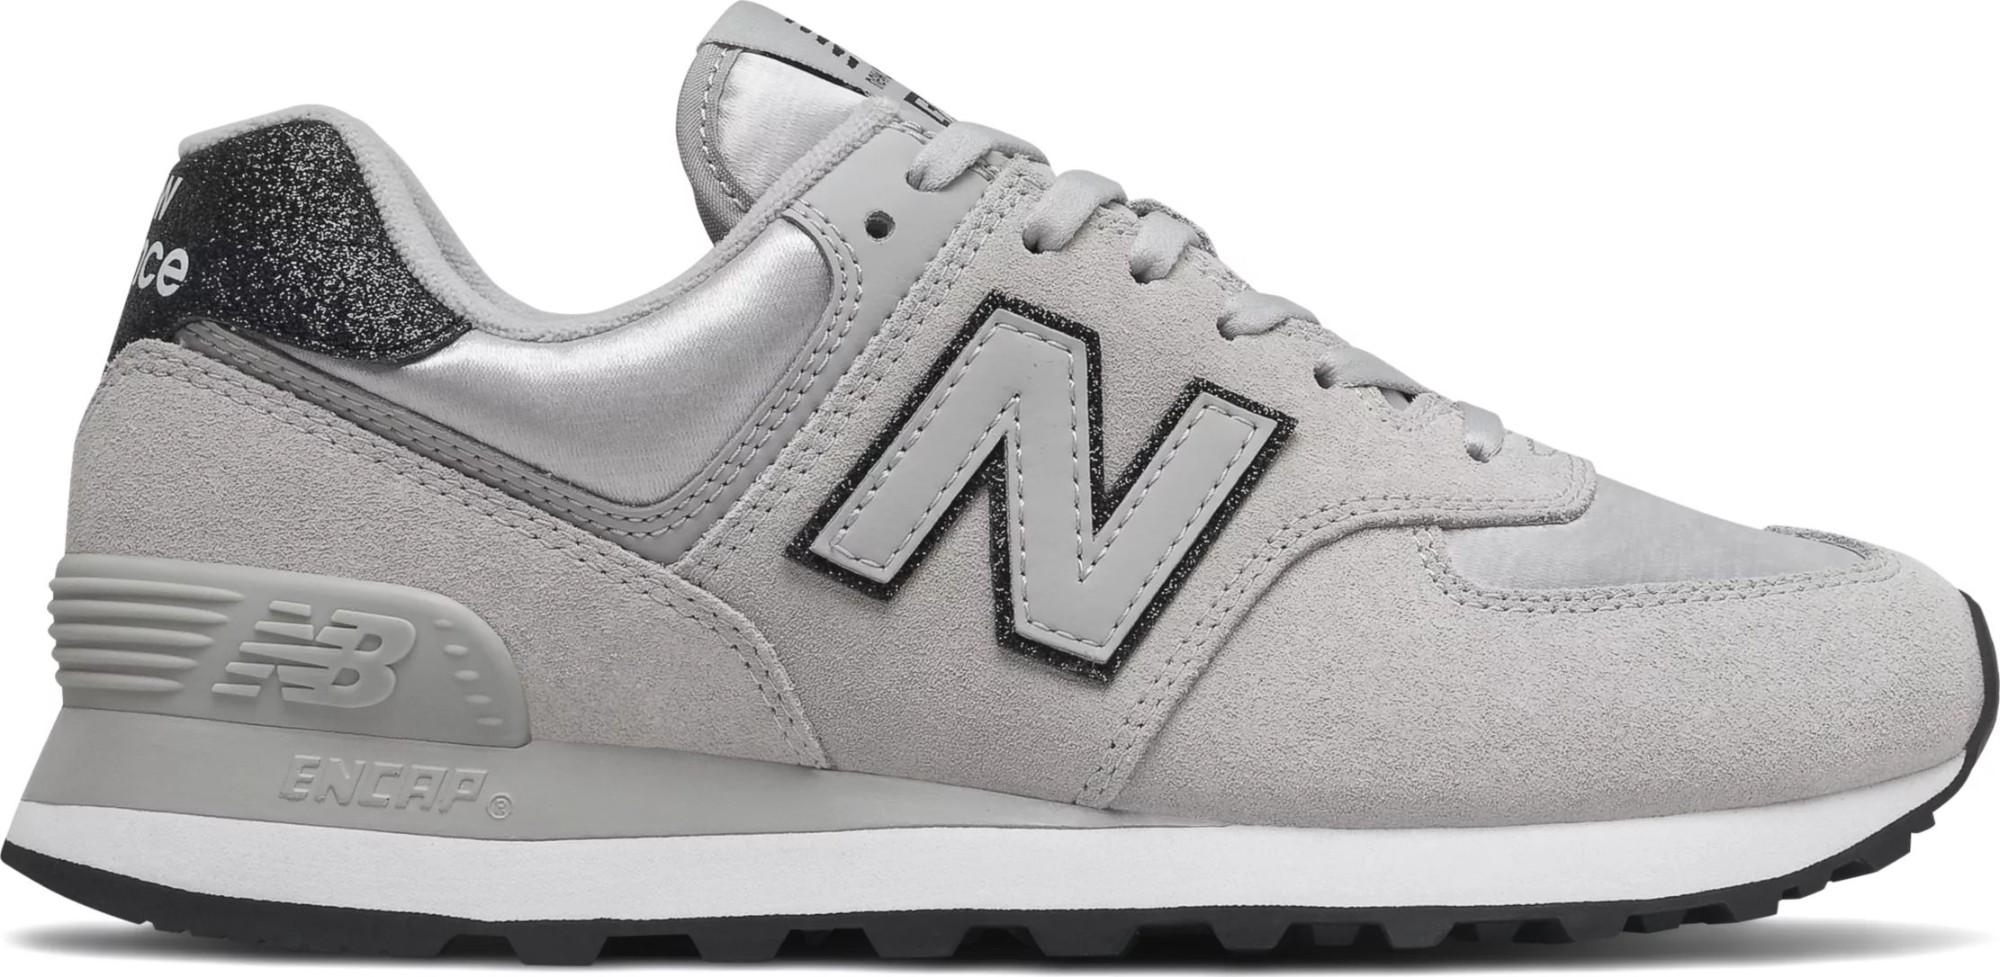 New Balance WL574 Nubuck Grey FM2 37,5